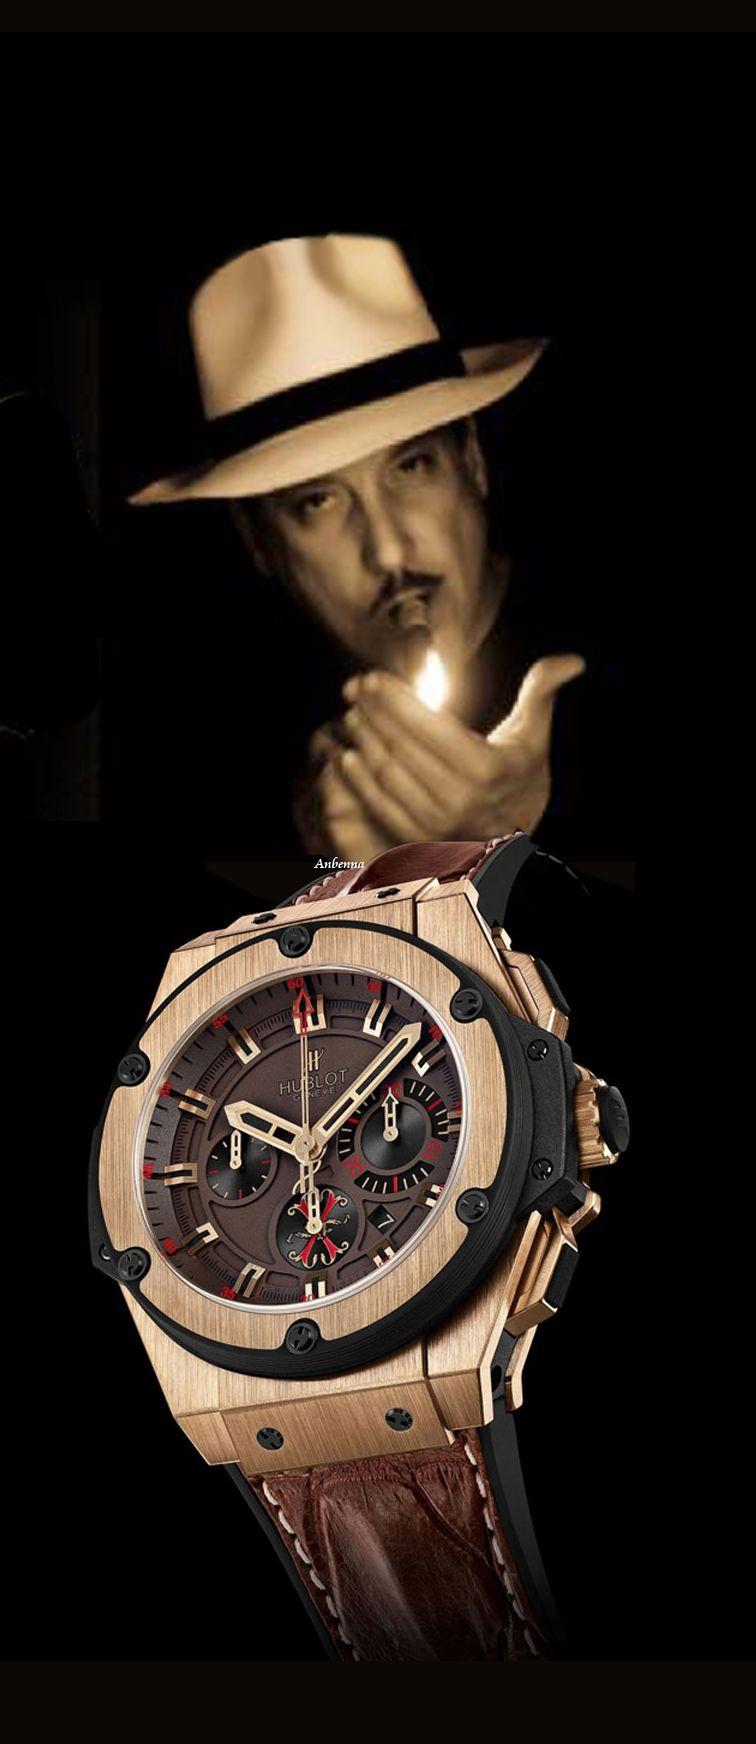 bc82d5fc0ed Hublot King Power Arturo Fuente Watch Honors the World s Rarest Cigar